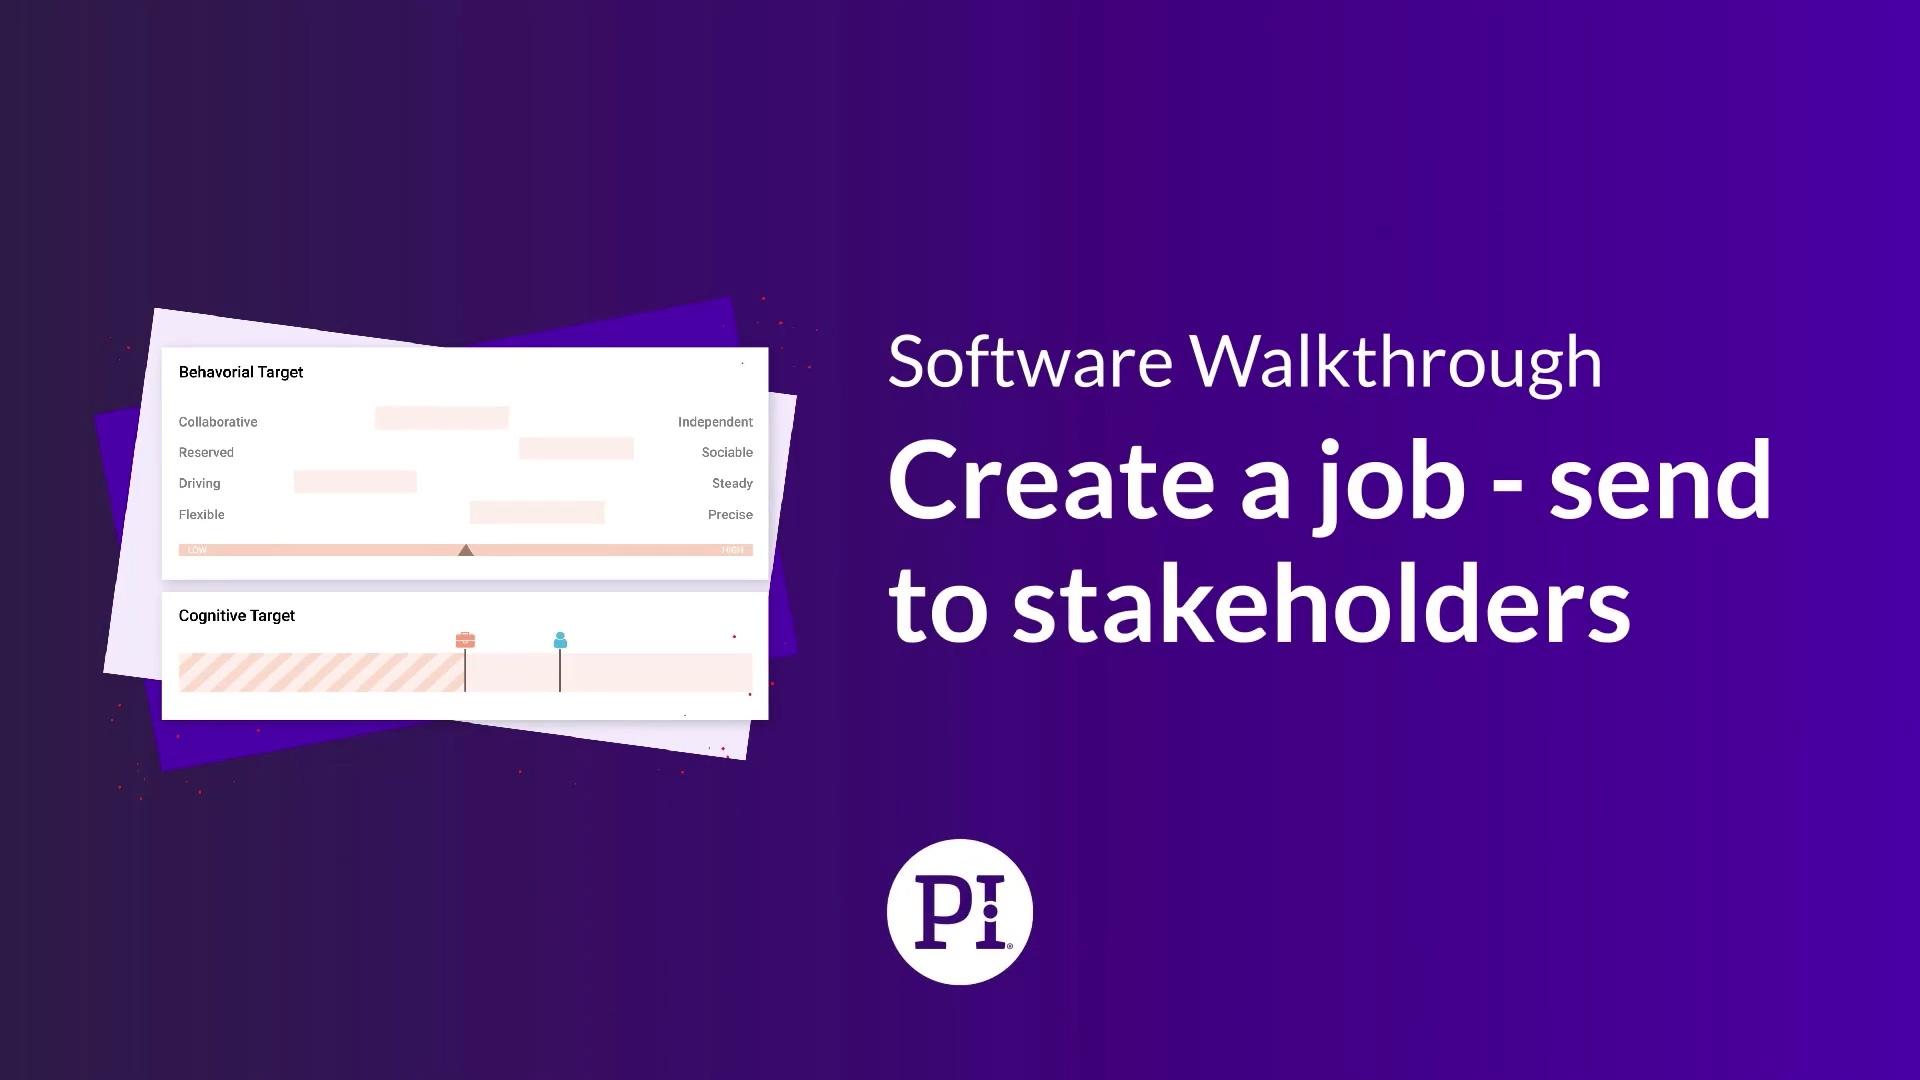 Create Job - Send to Stakeholders